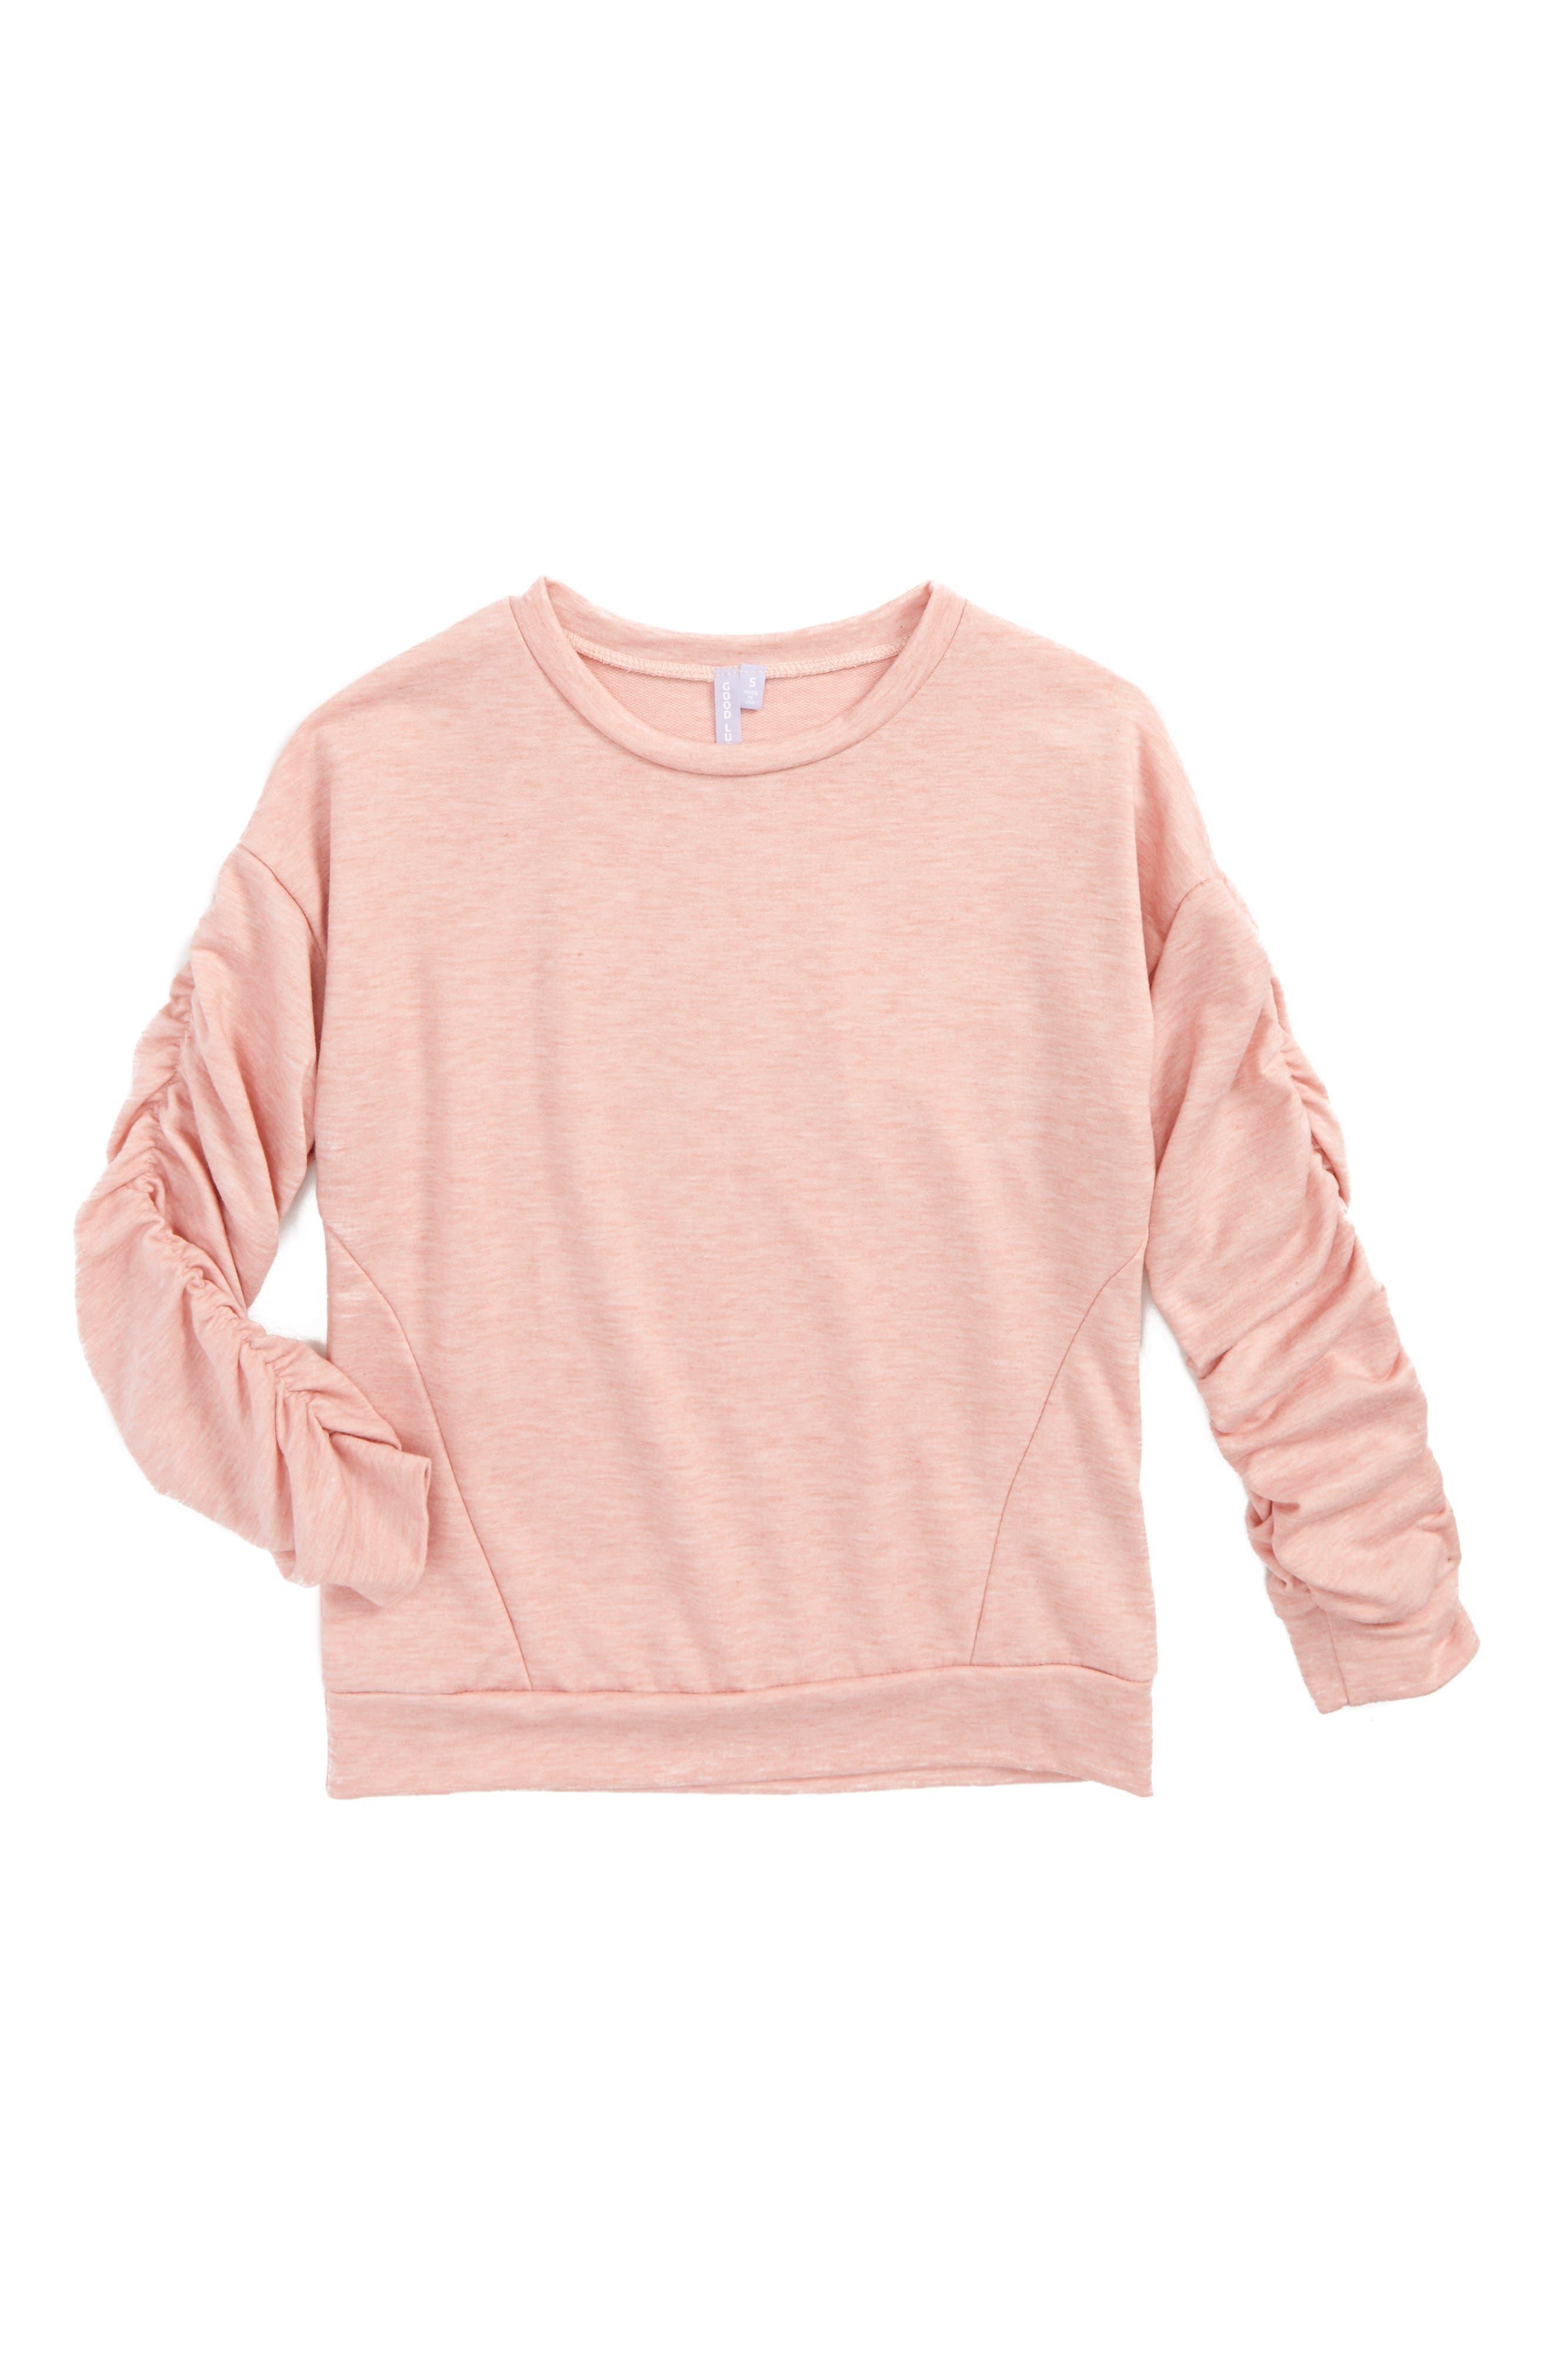 Alternate Image 1 Selected - Good Luck Gem Ruched Sleeve Sweatshirt (Big Girls)